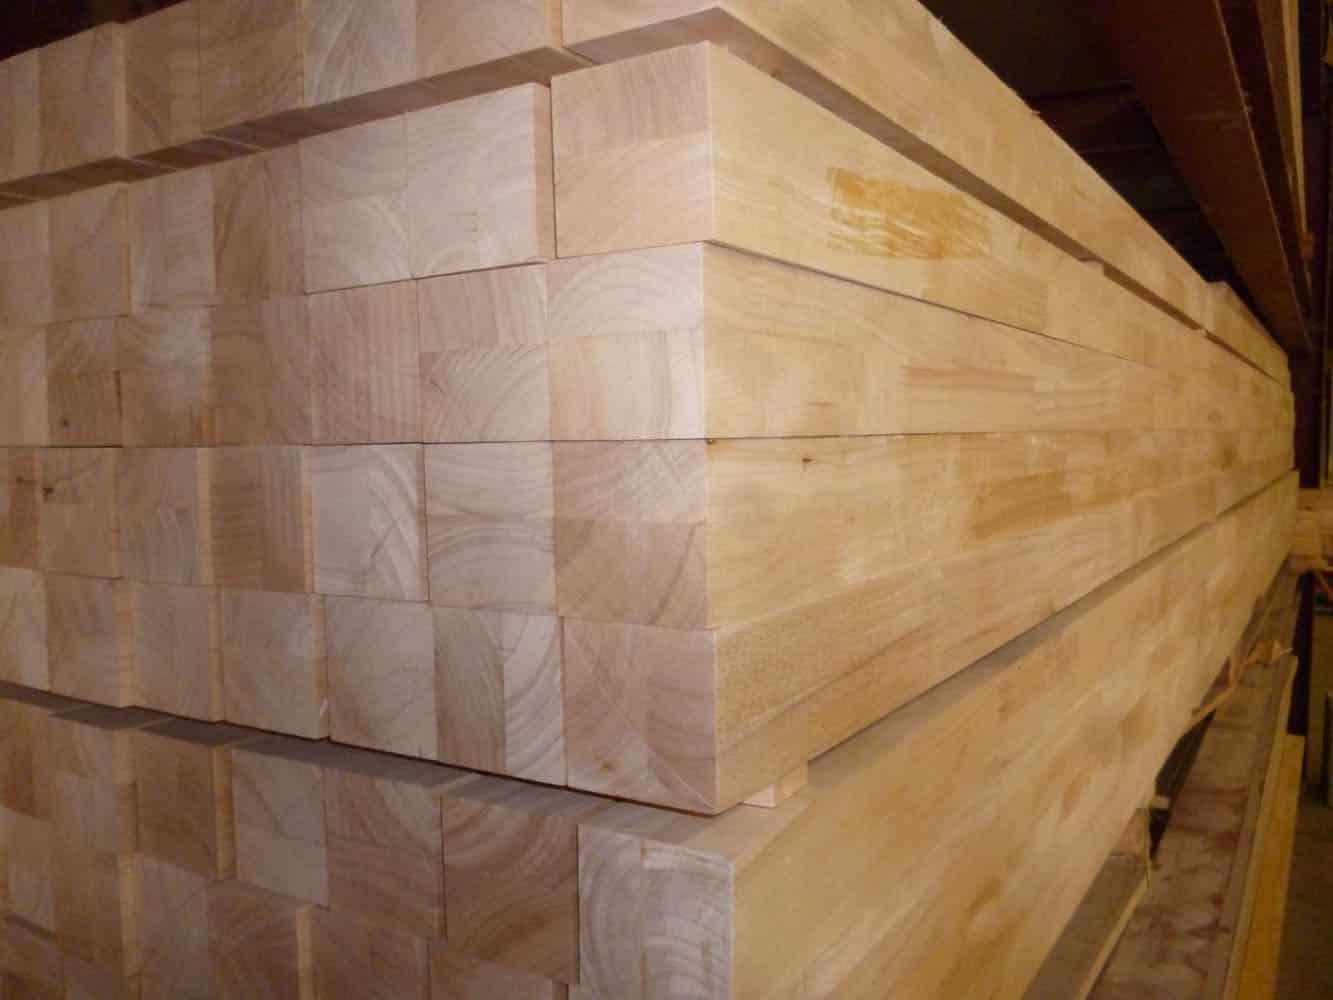 styl 39 escalier les escaliers en bois h v a. Black Bedroom Furniture Sets. Home Design Ideas